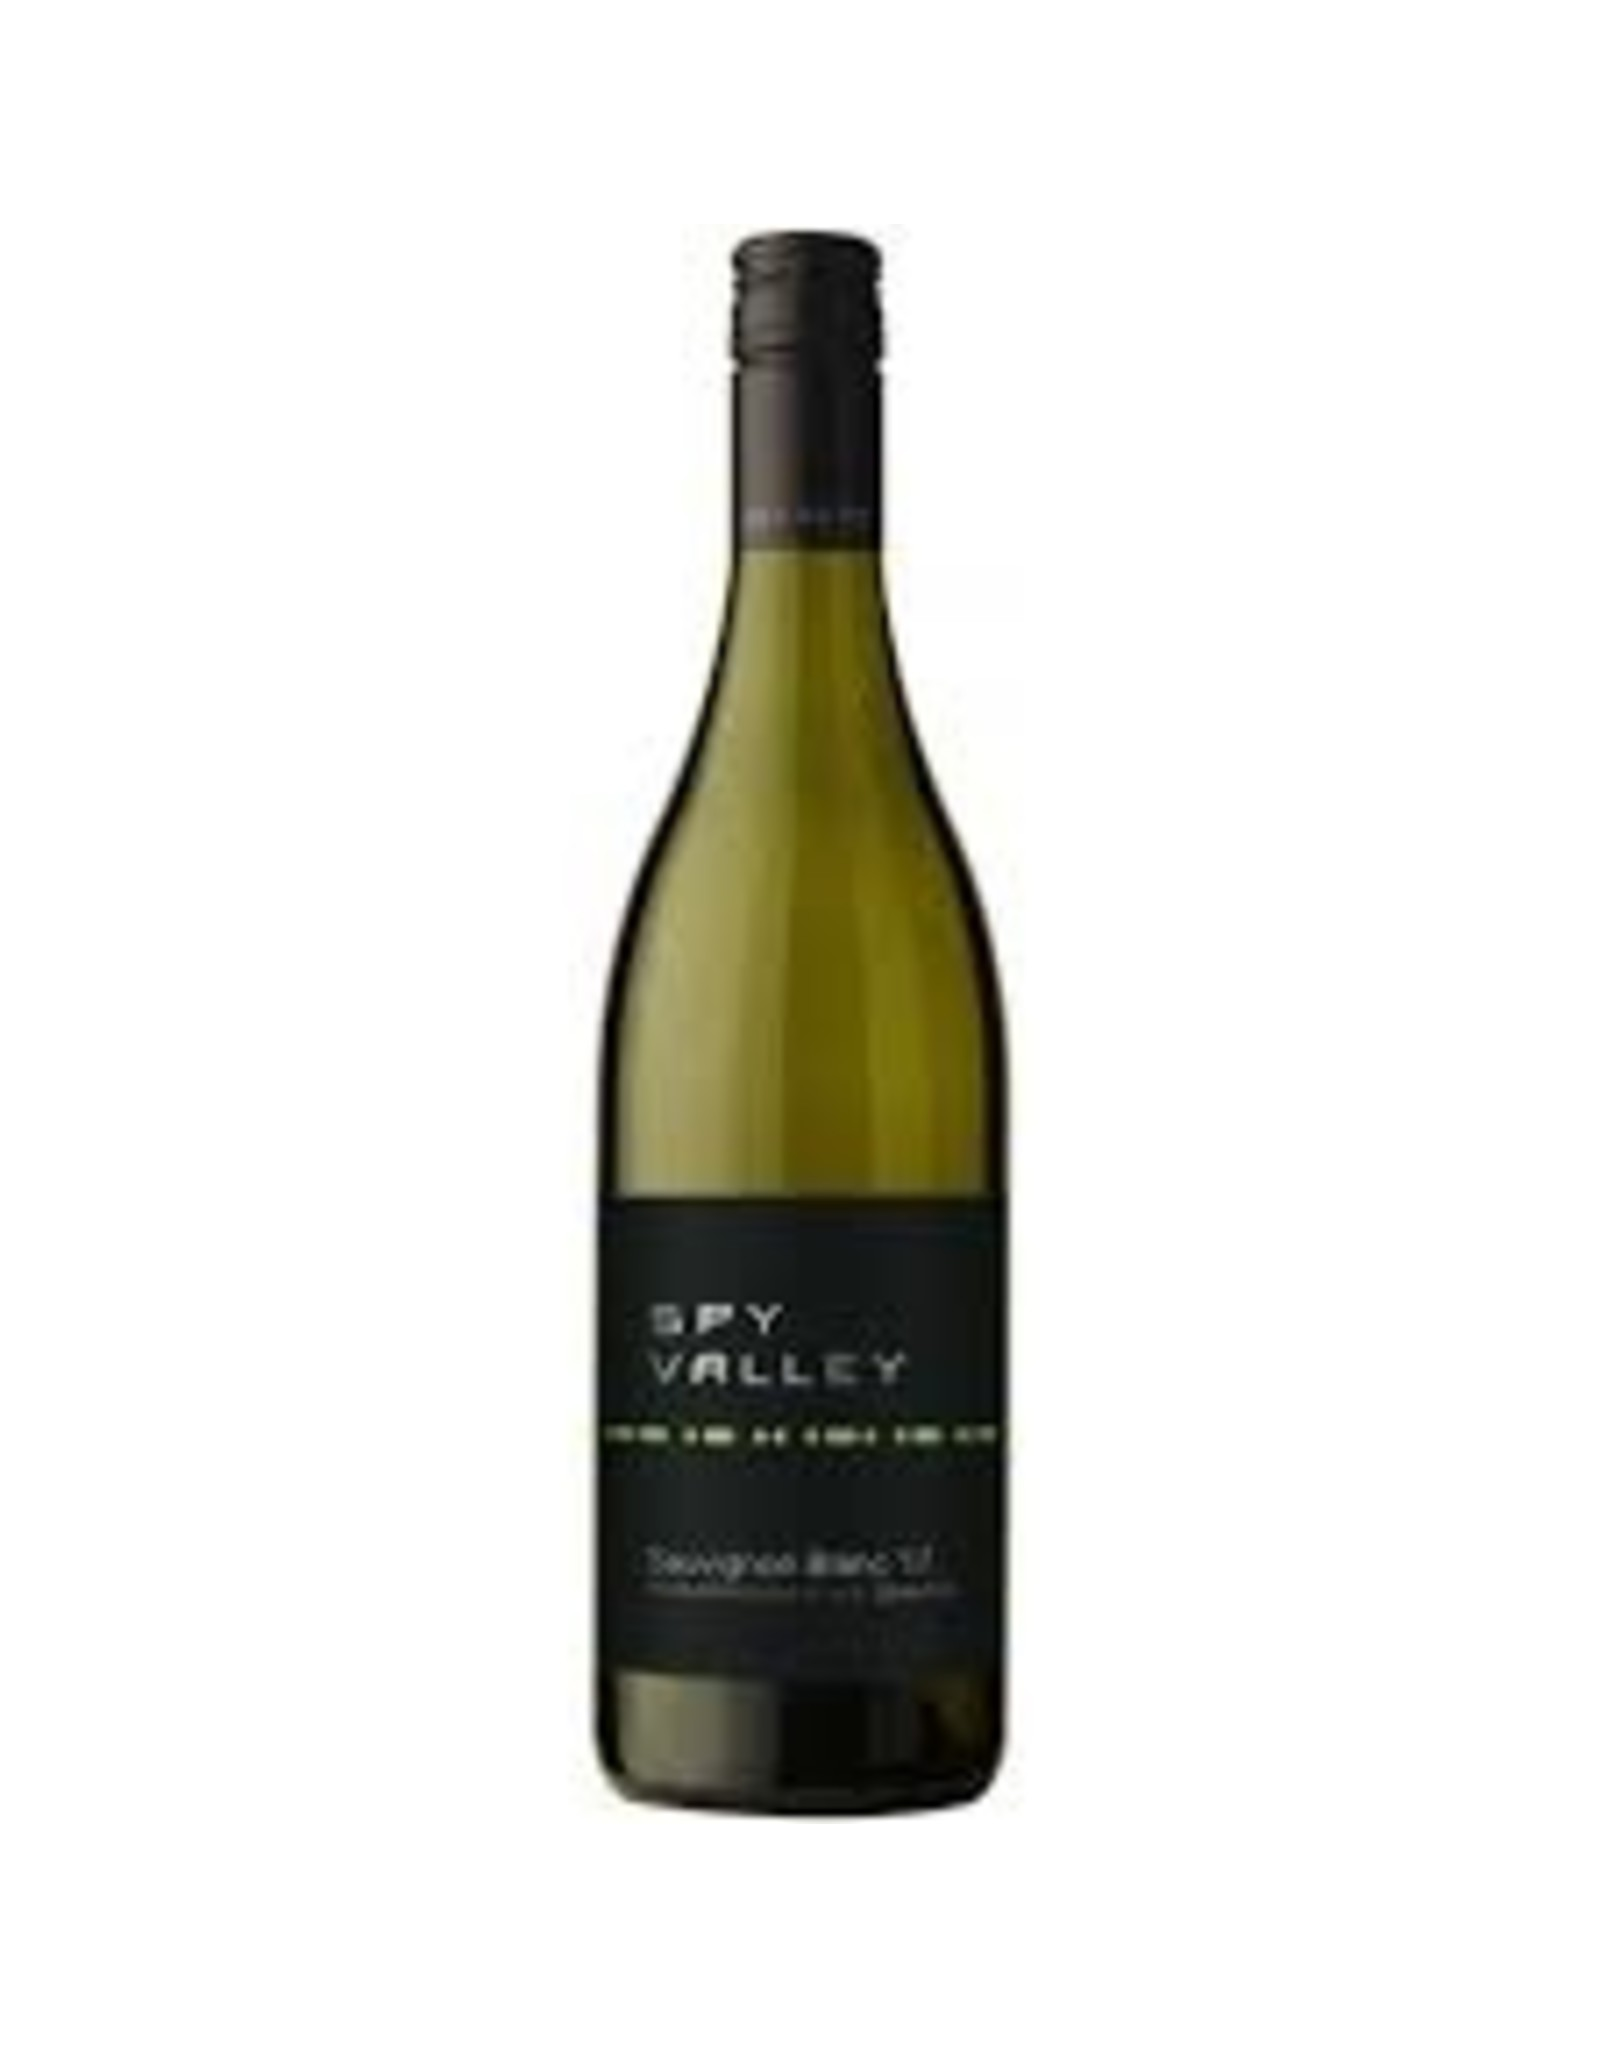 Broadbent Spy Valley Sauvignon Blanc